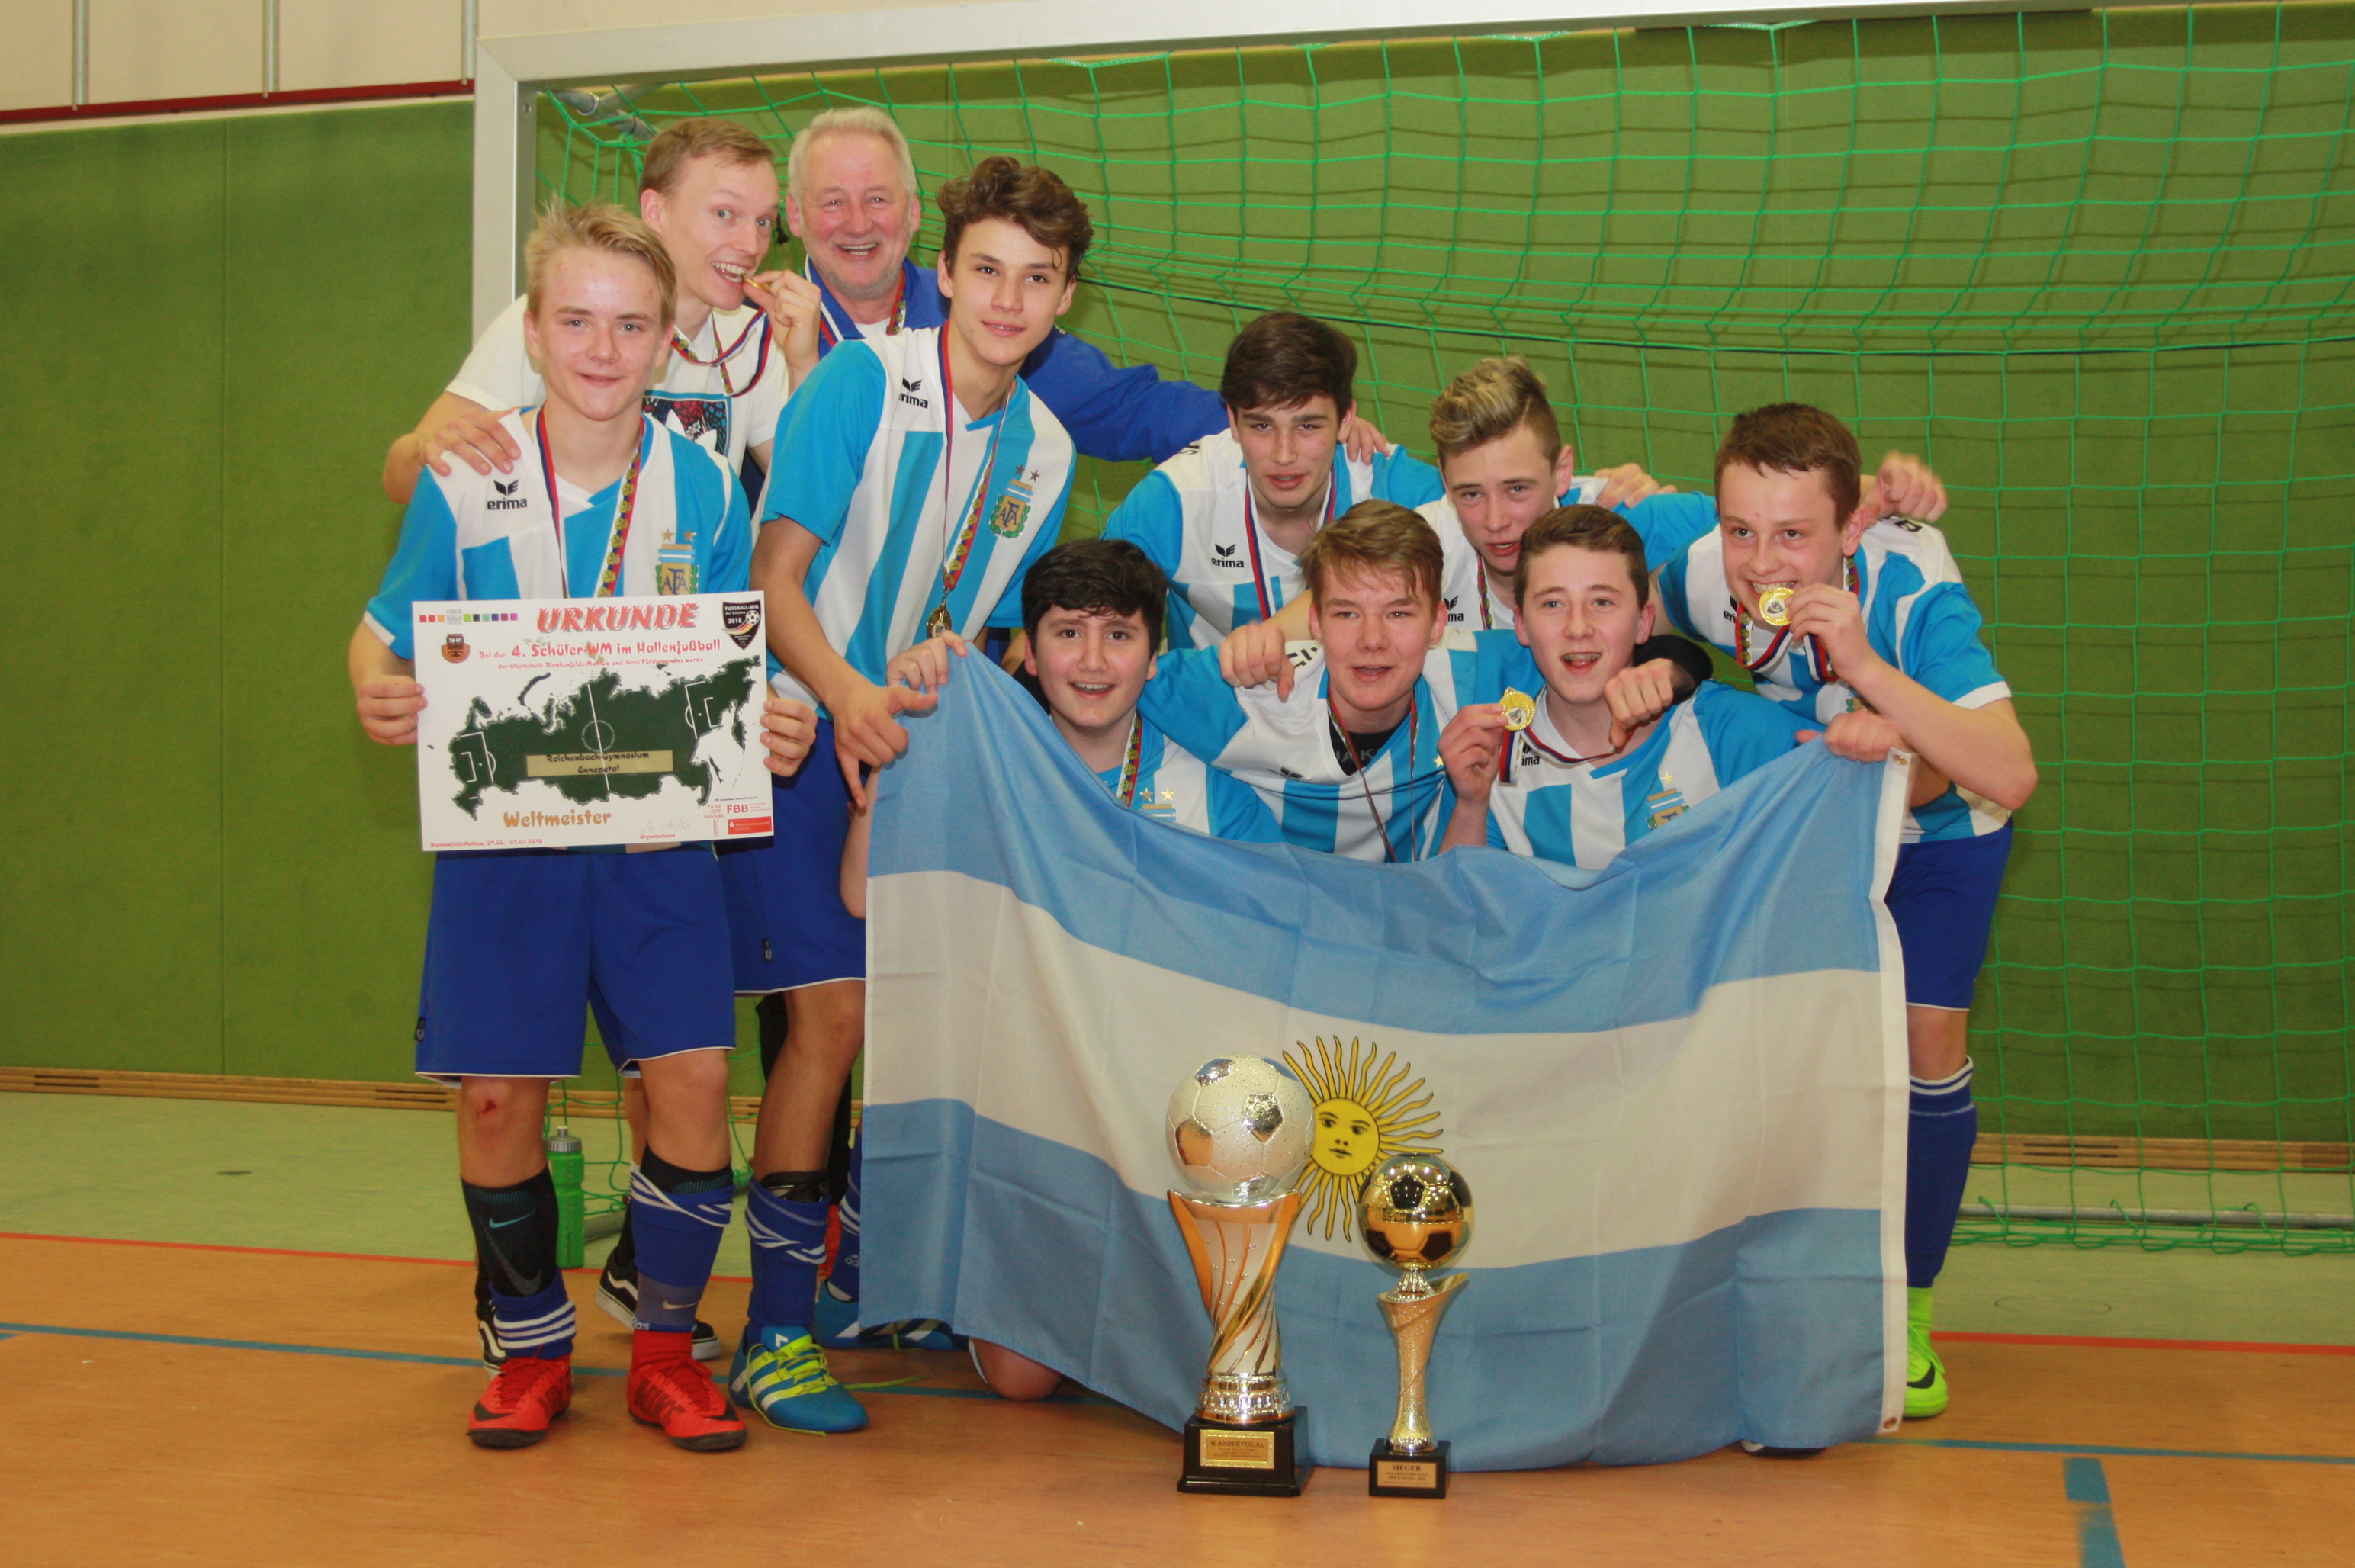 Fussball Weltmeister Der Schulen 2018 Ist